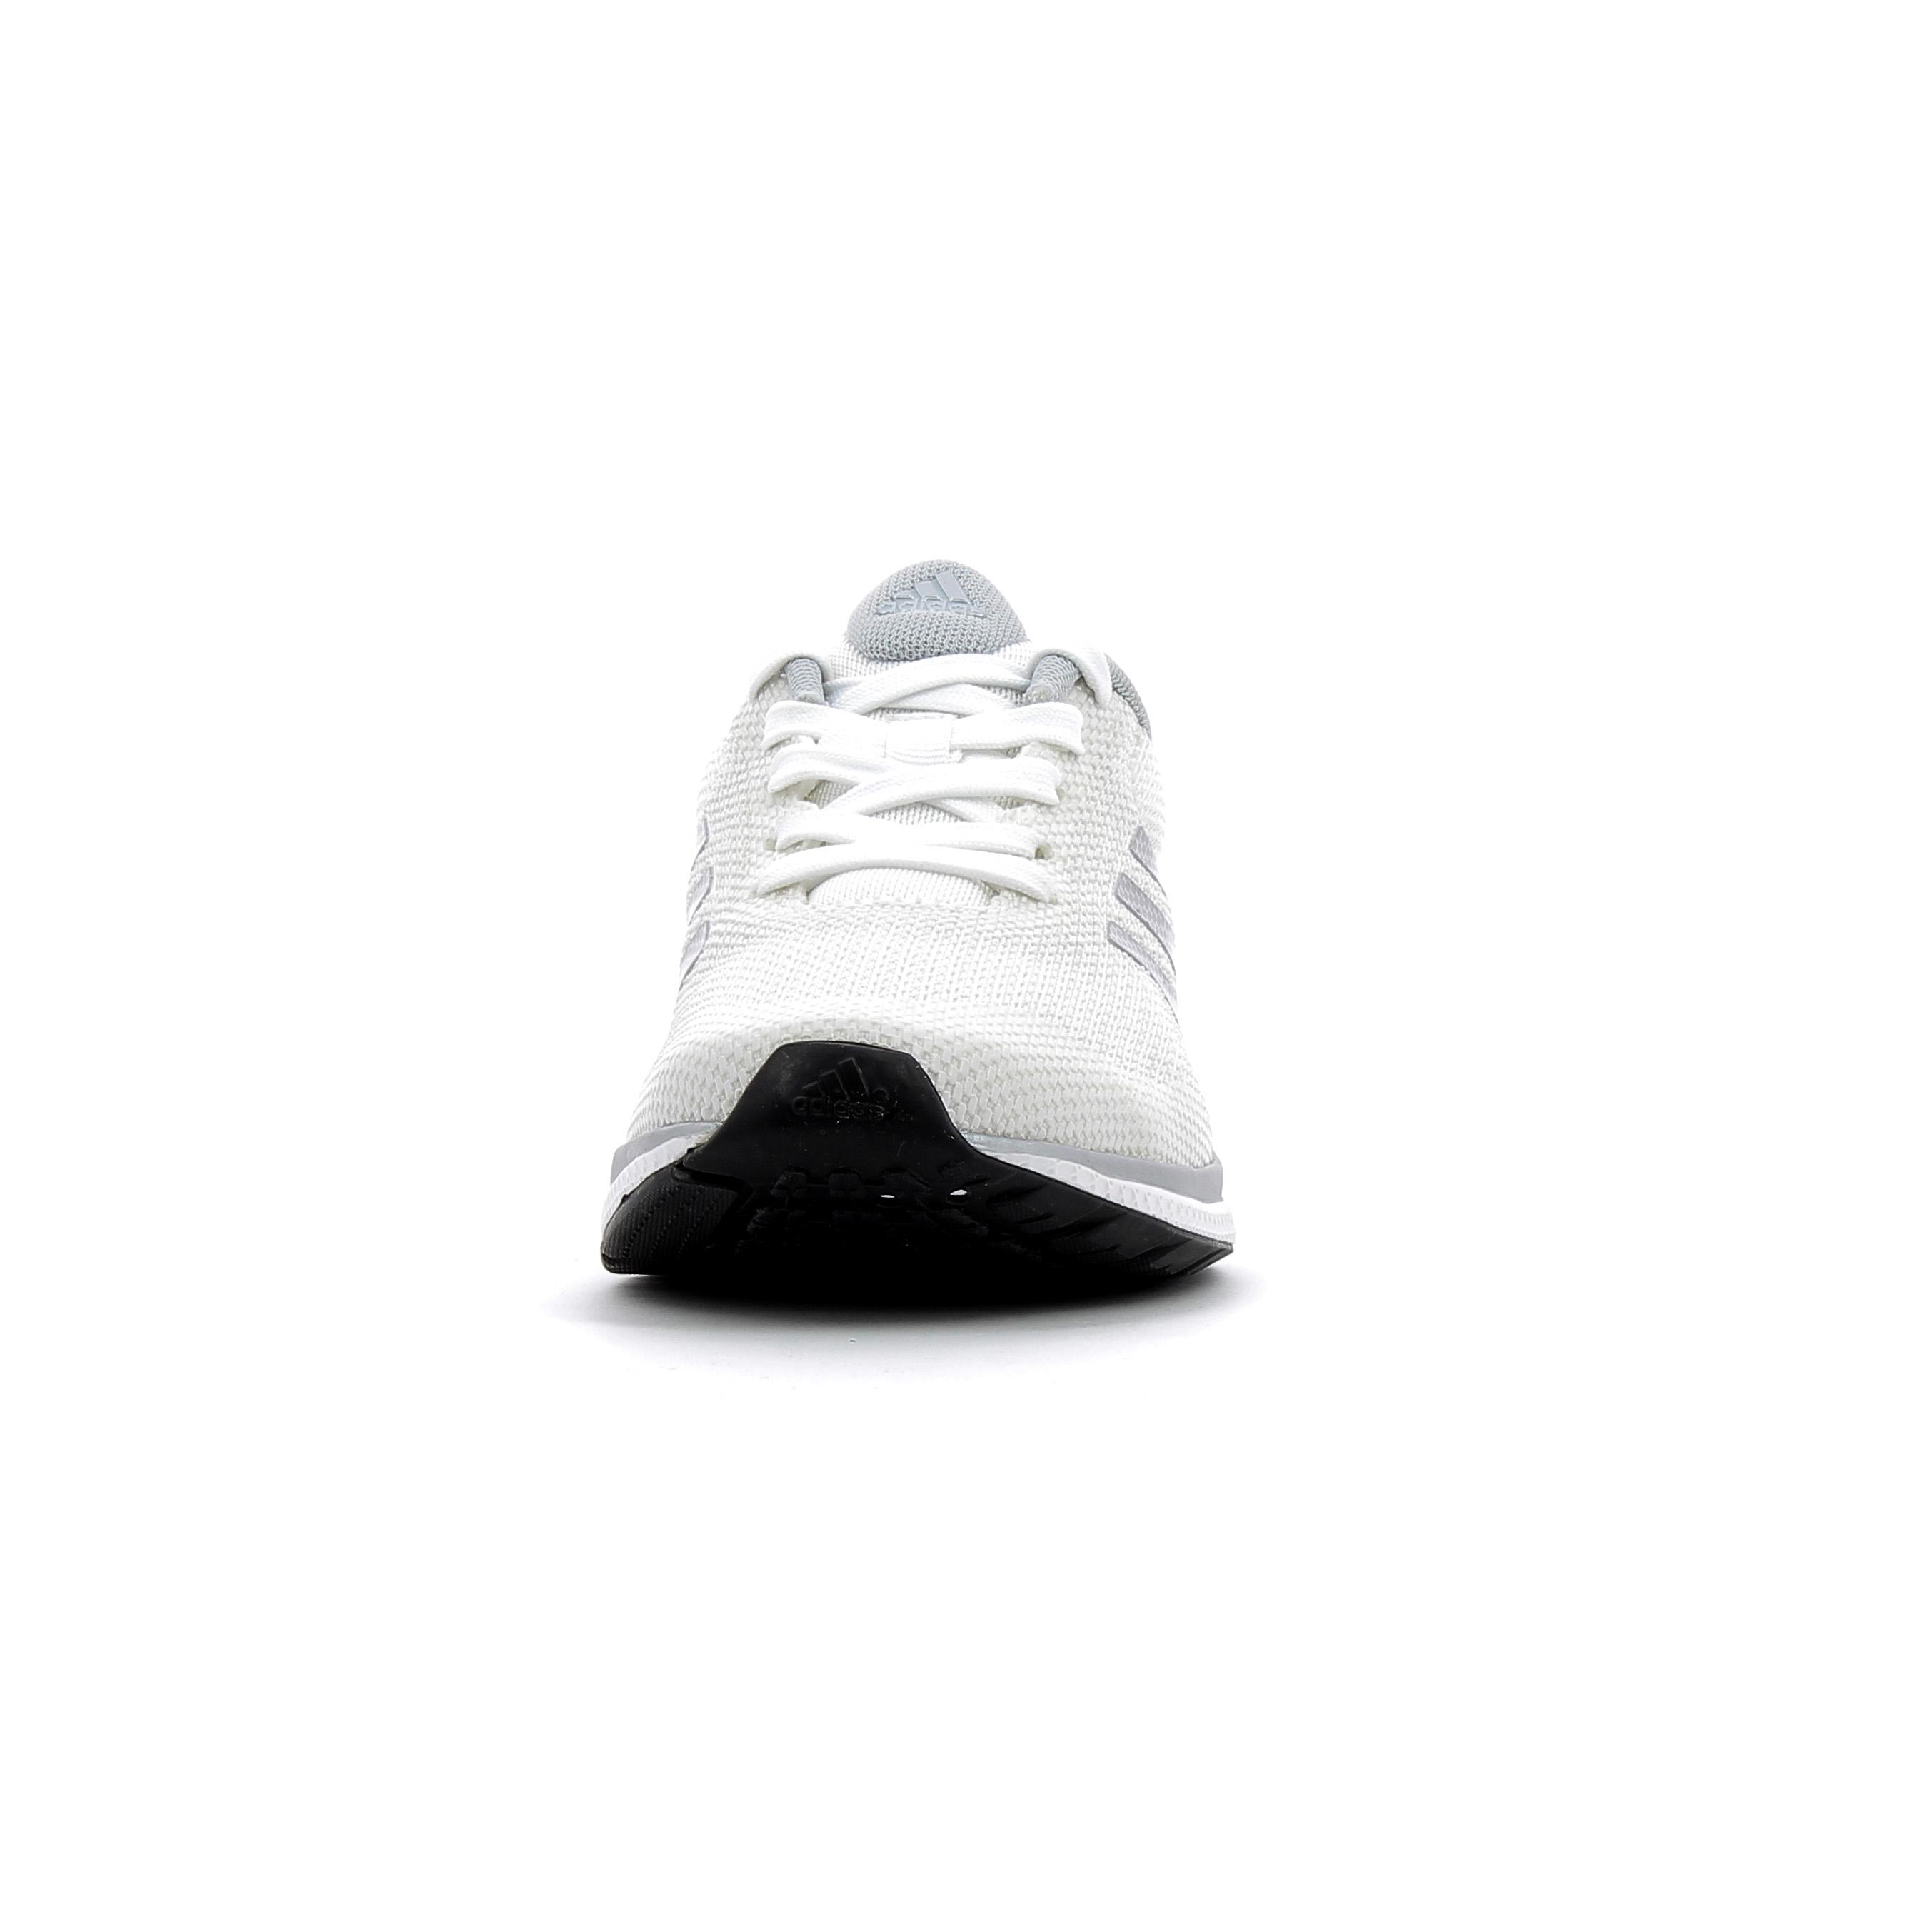 Royaume-Uni disponibilité b2508 20f53 Chaussure de running Adidas Performance Mana Bounce 2 W Aramis